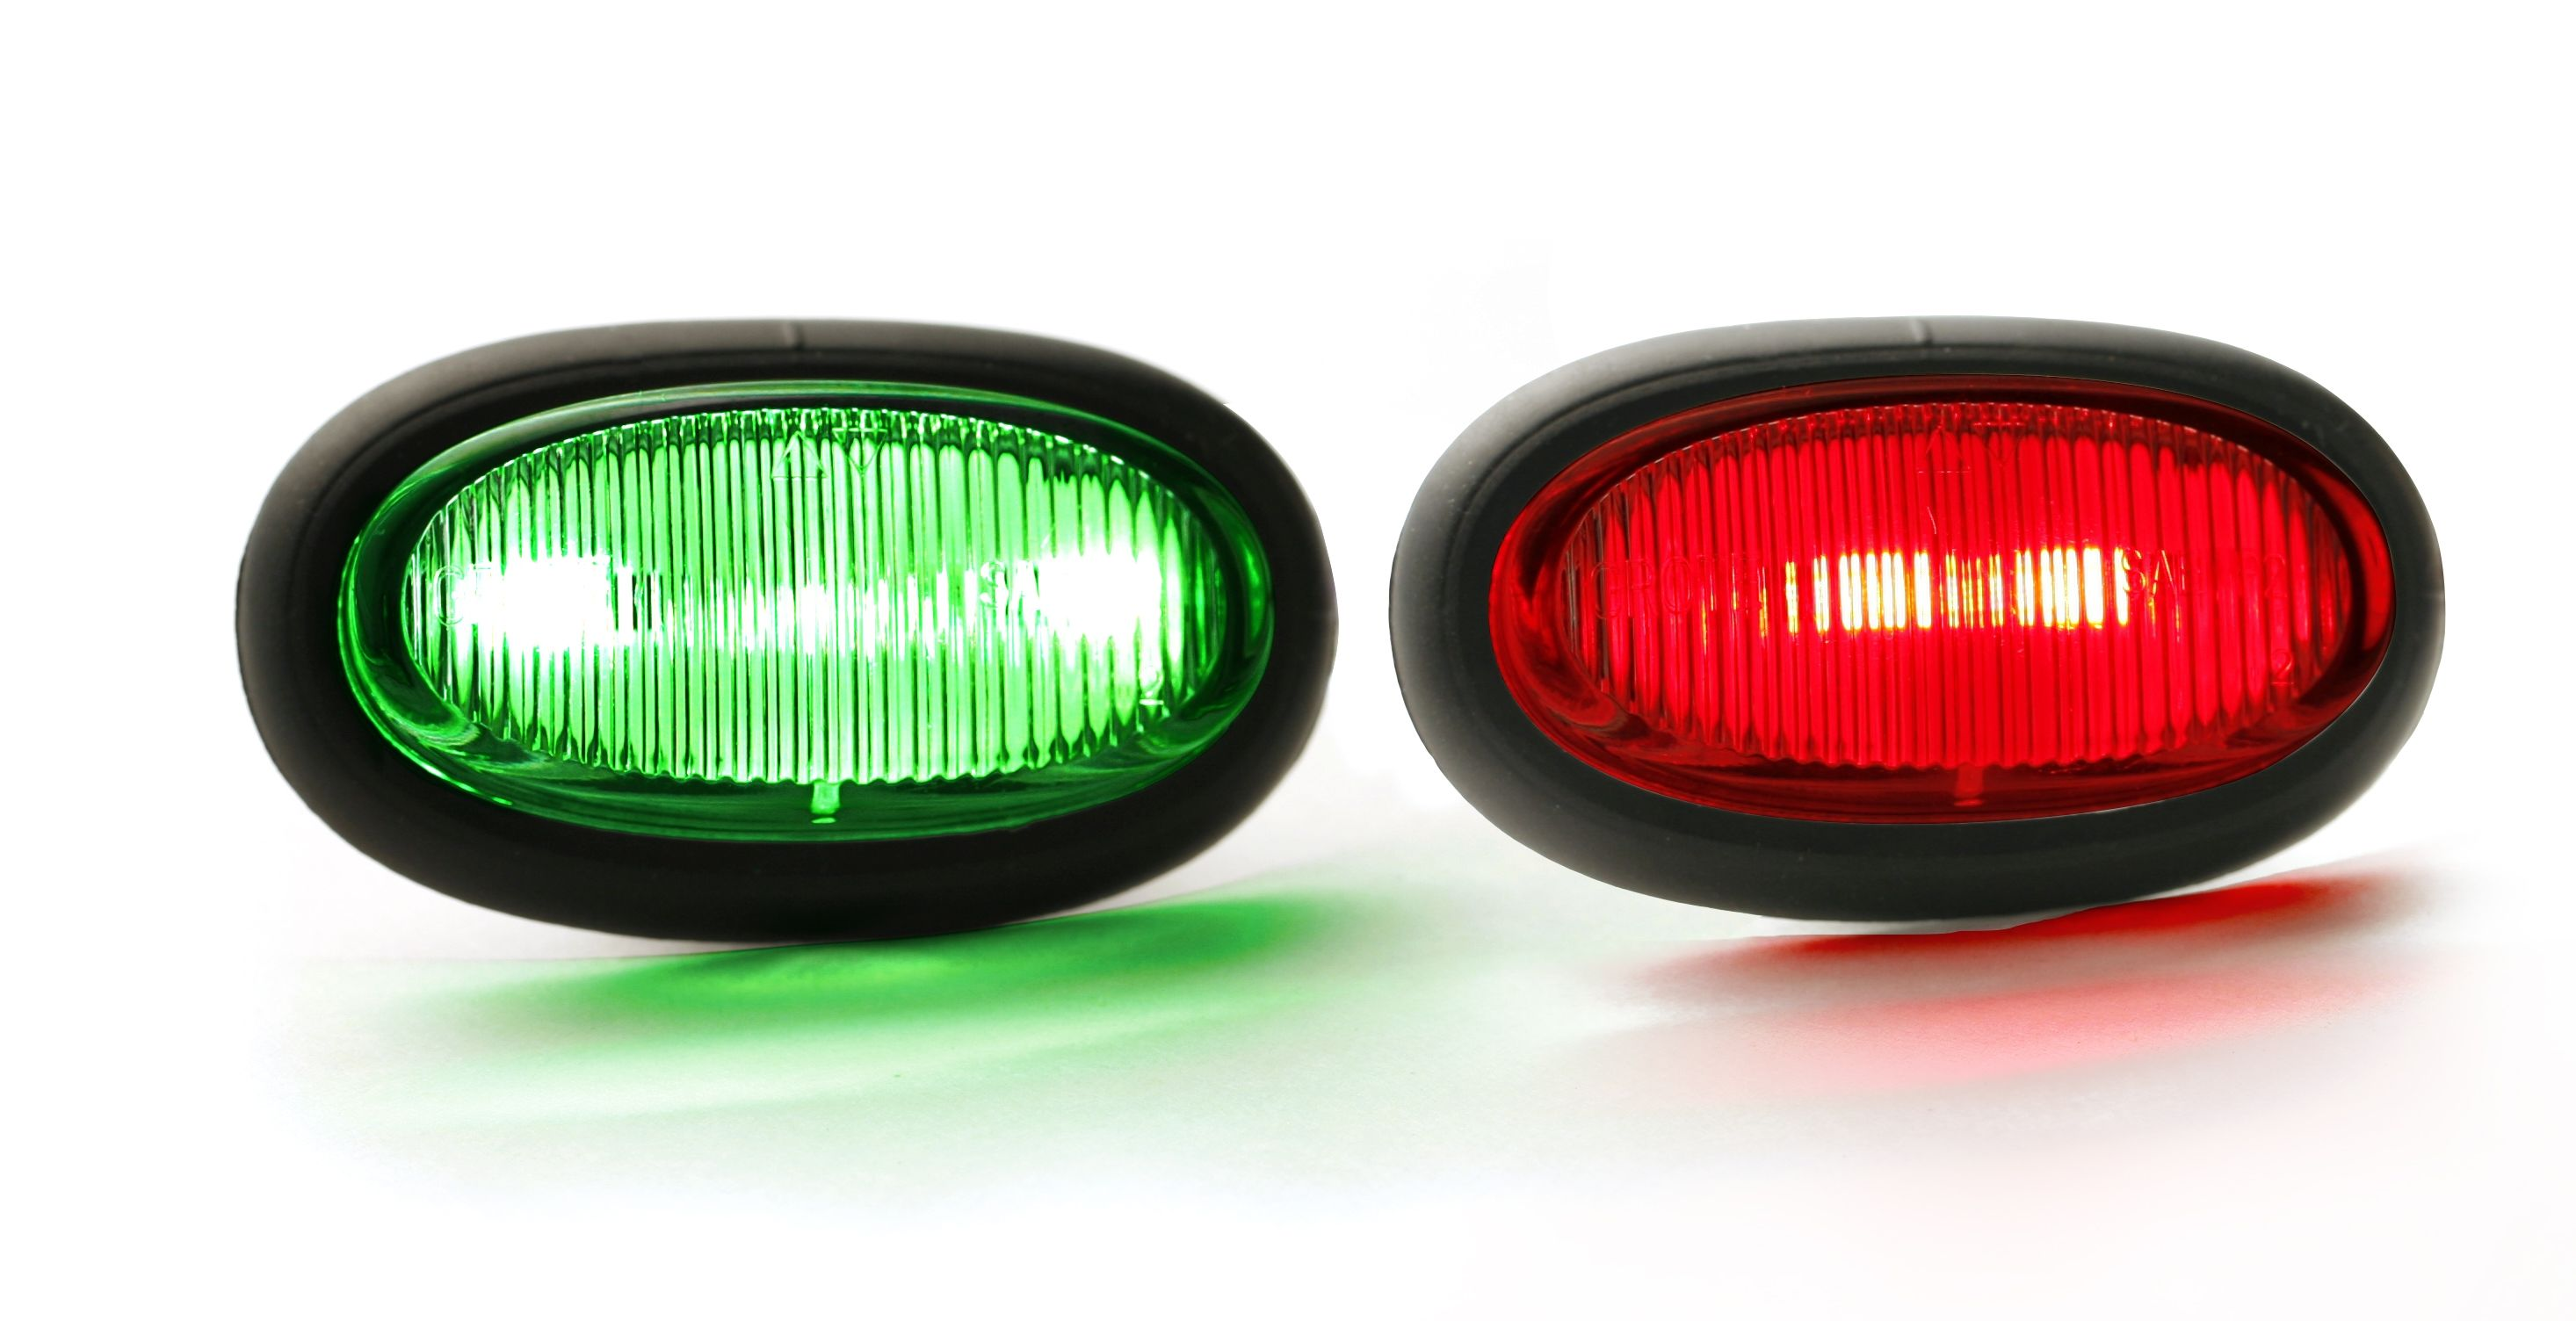 lights pairs green bellydancediscount with silk led light fans up com bellydance of lighting en multicolor